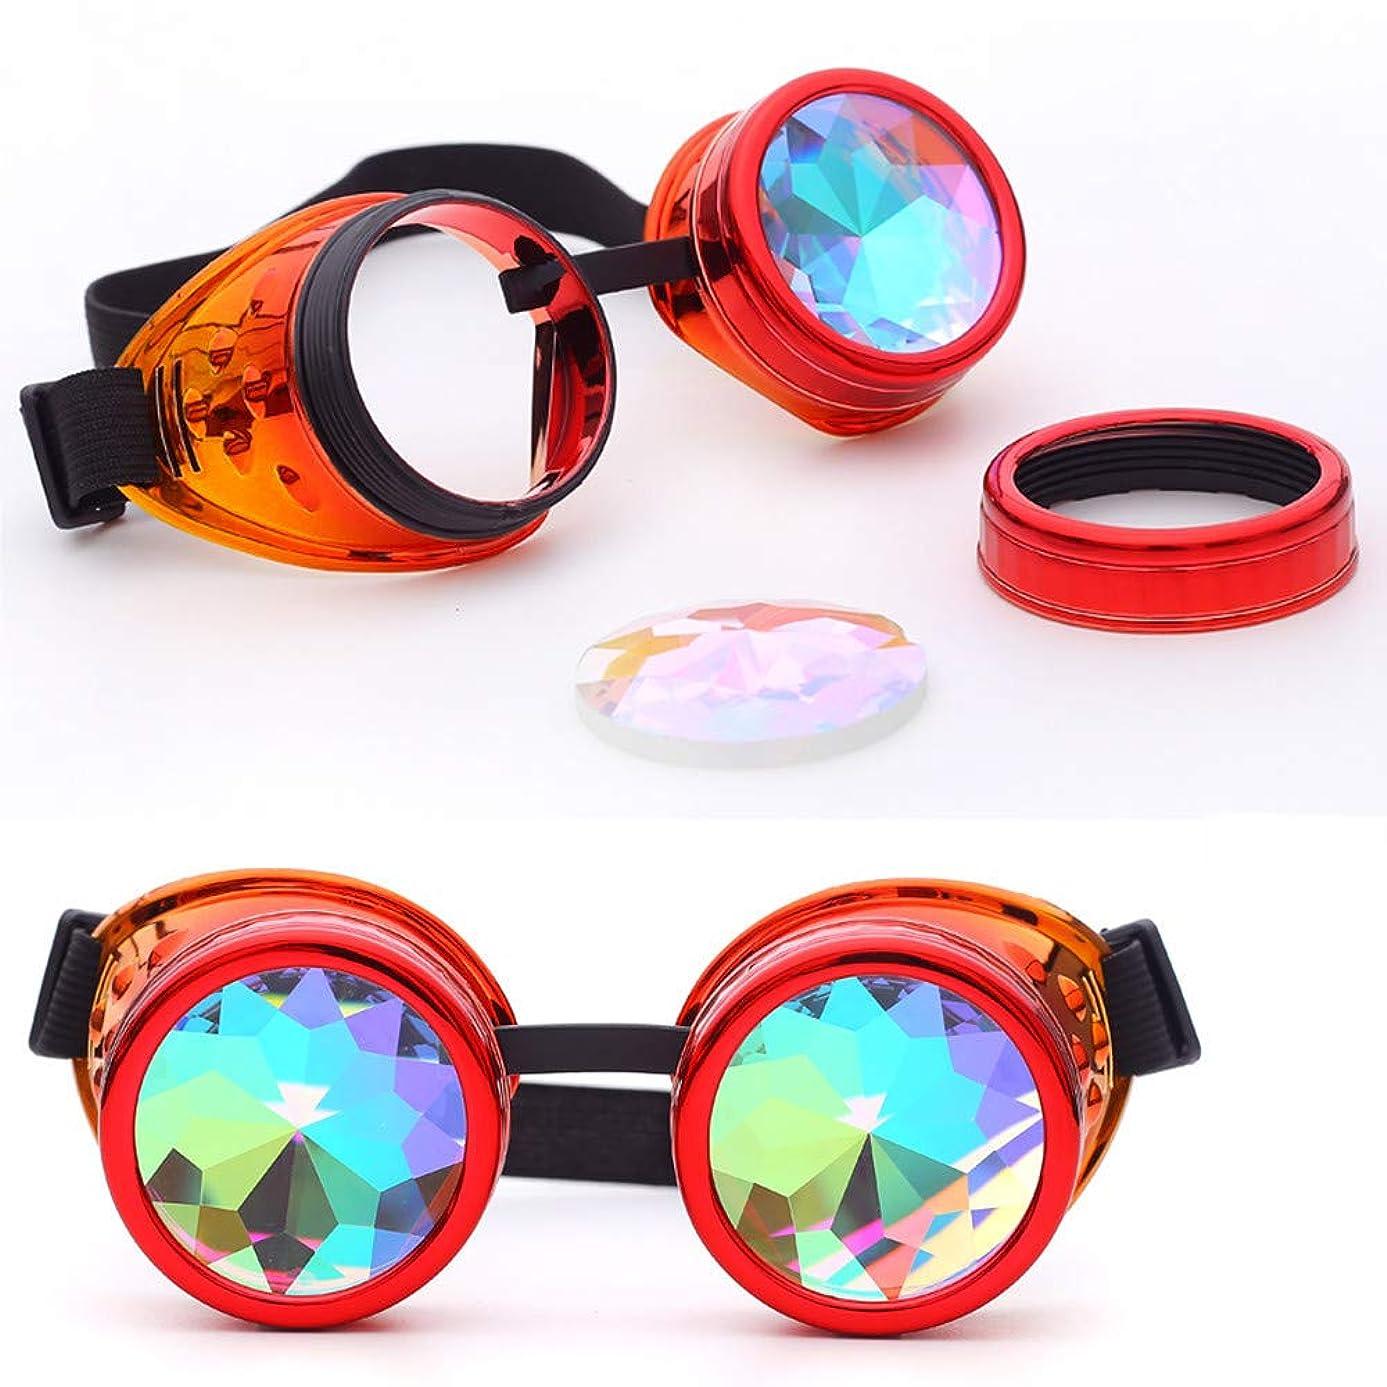 Sunglasses for Women Myoumobi_ Kaleidoscope Steampunk Rave Glasses Goggles with Rainbow Crystal Glass Lens